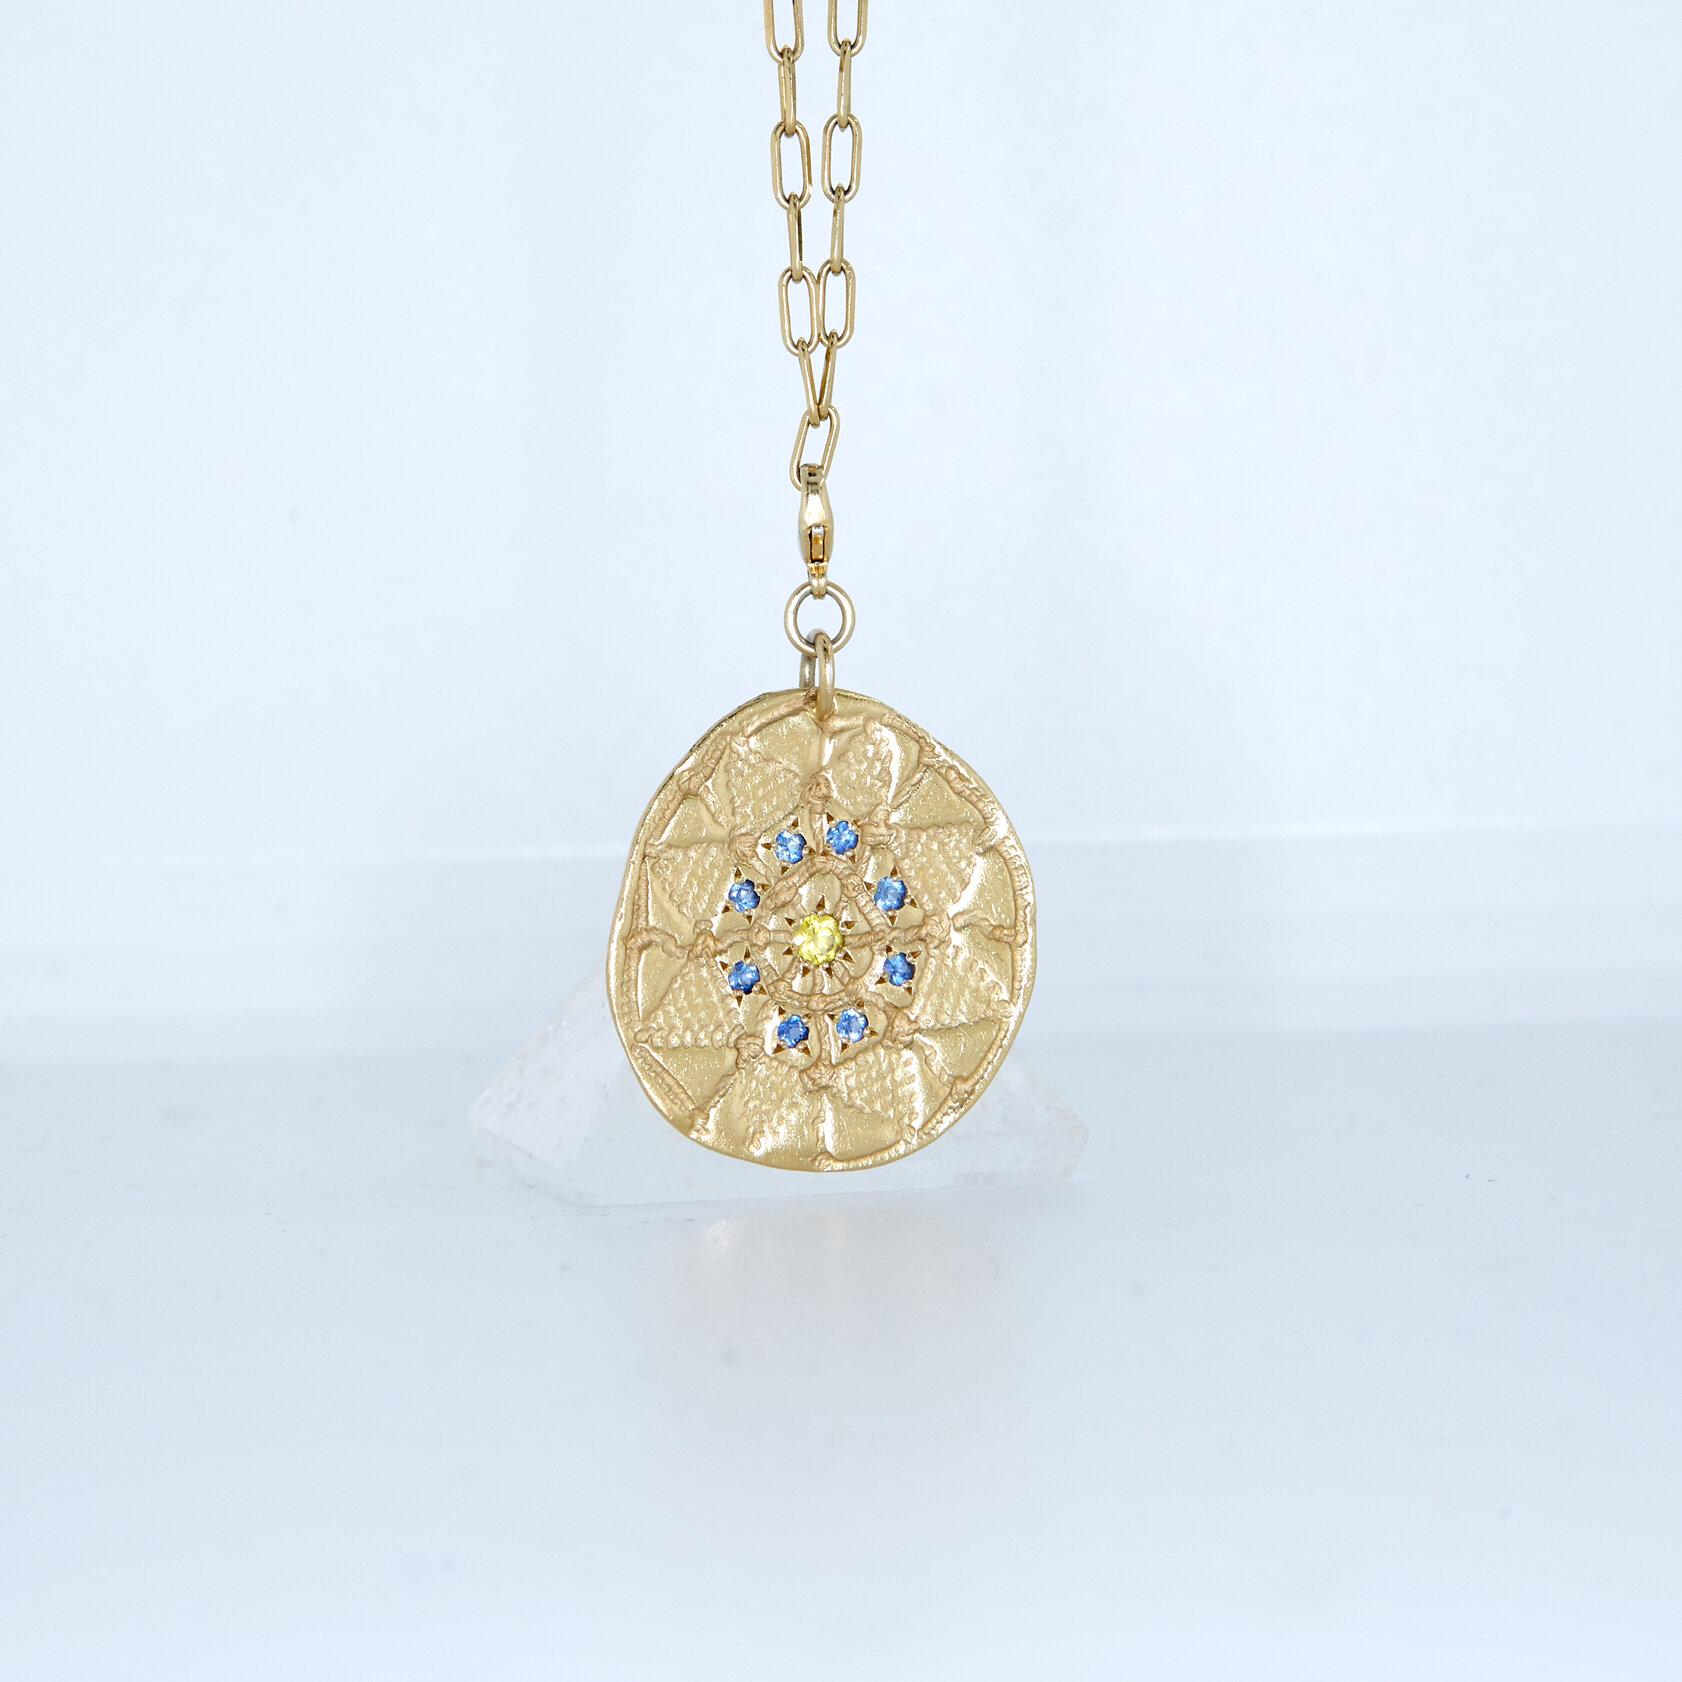 clara-jasmine-collier-talisman-AIYANA-Saphirs-bleu-jaune.jpg